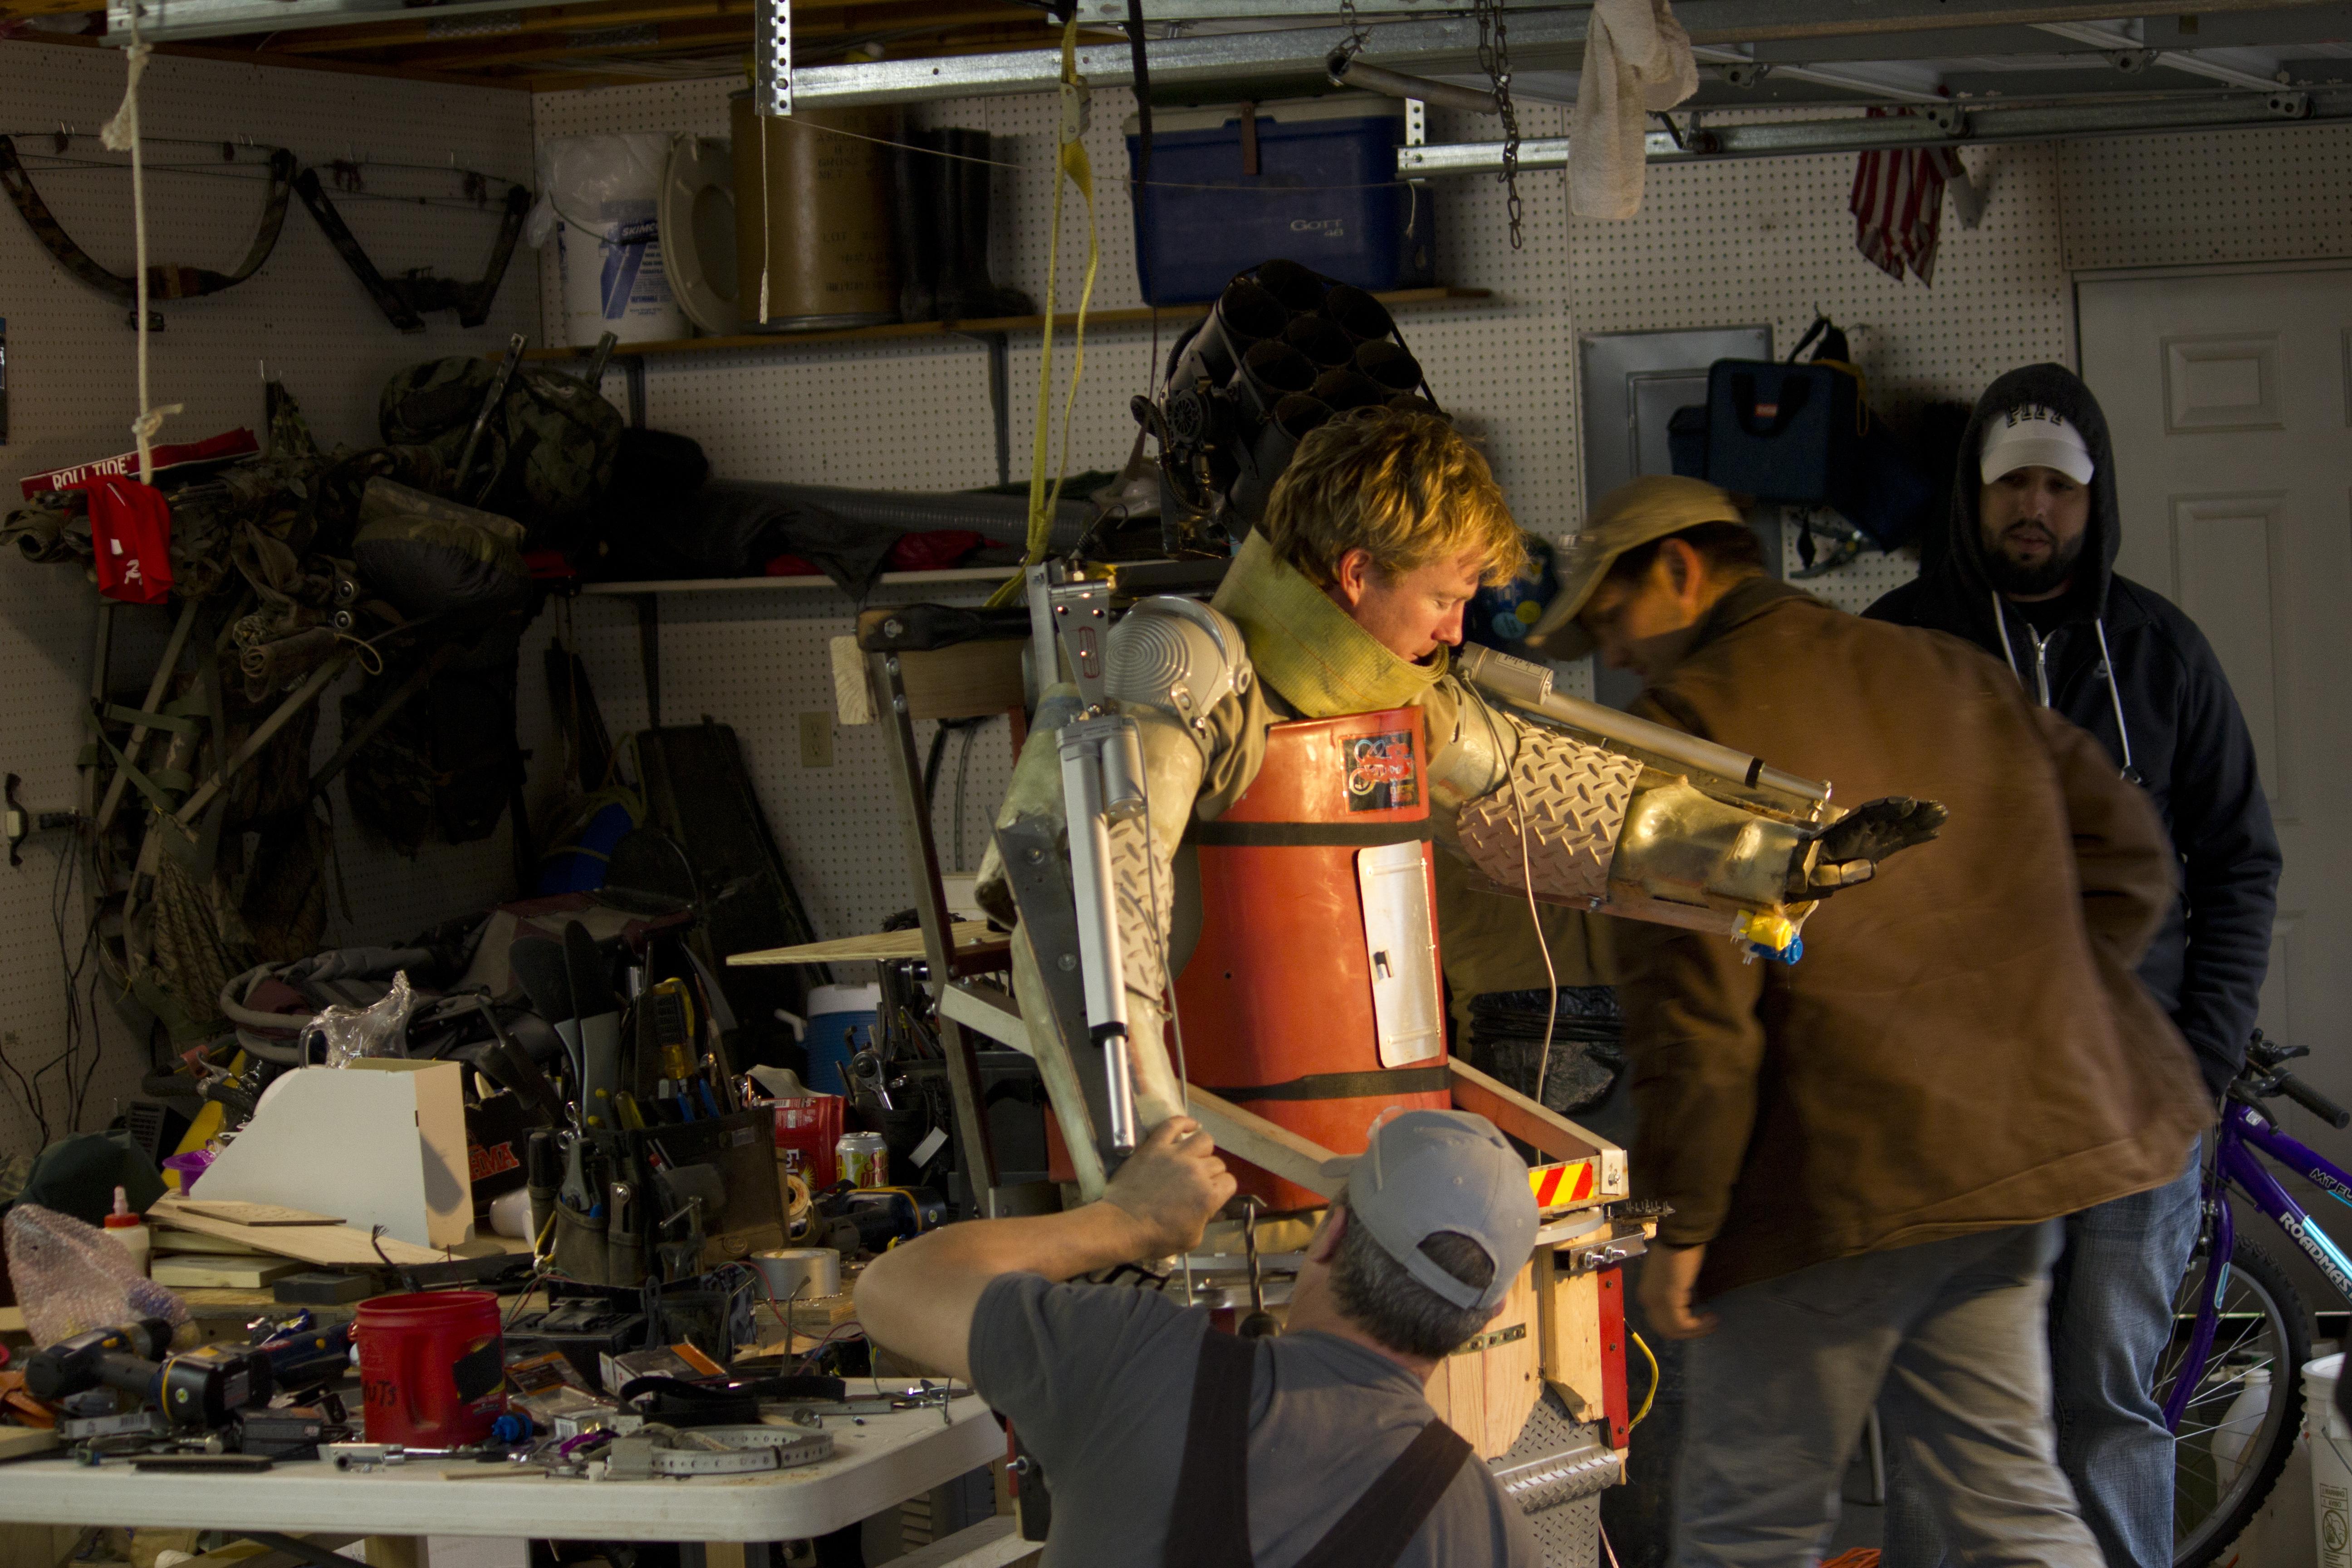 Rocket City Rednecks build Exoskeleton Suit